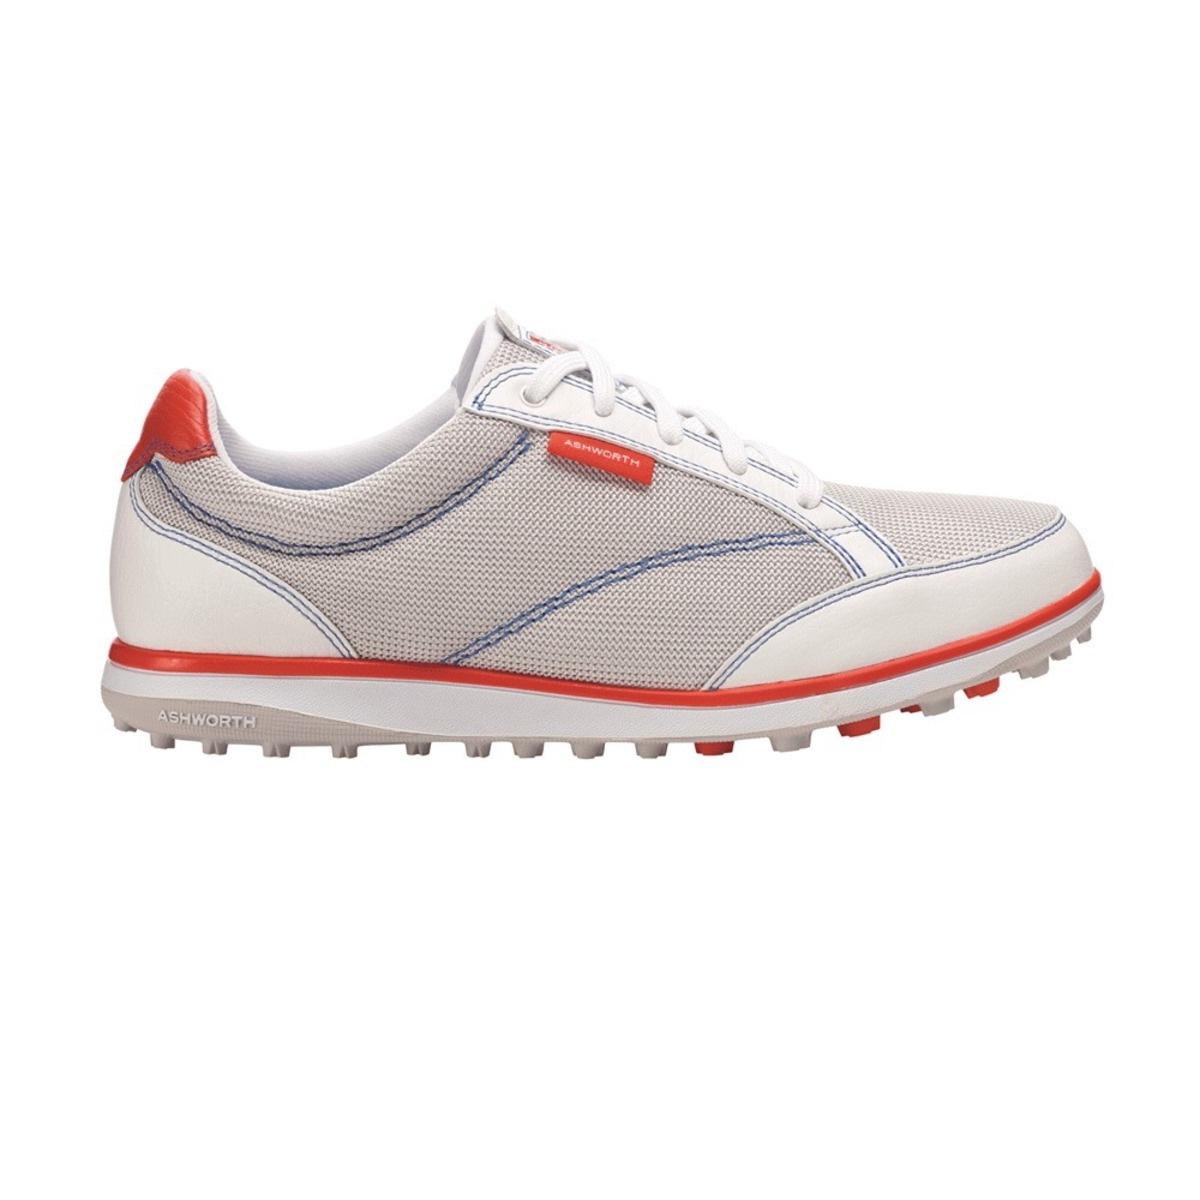 Ashworth Golf Shoes Size